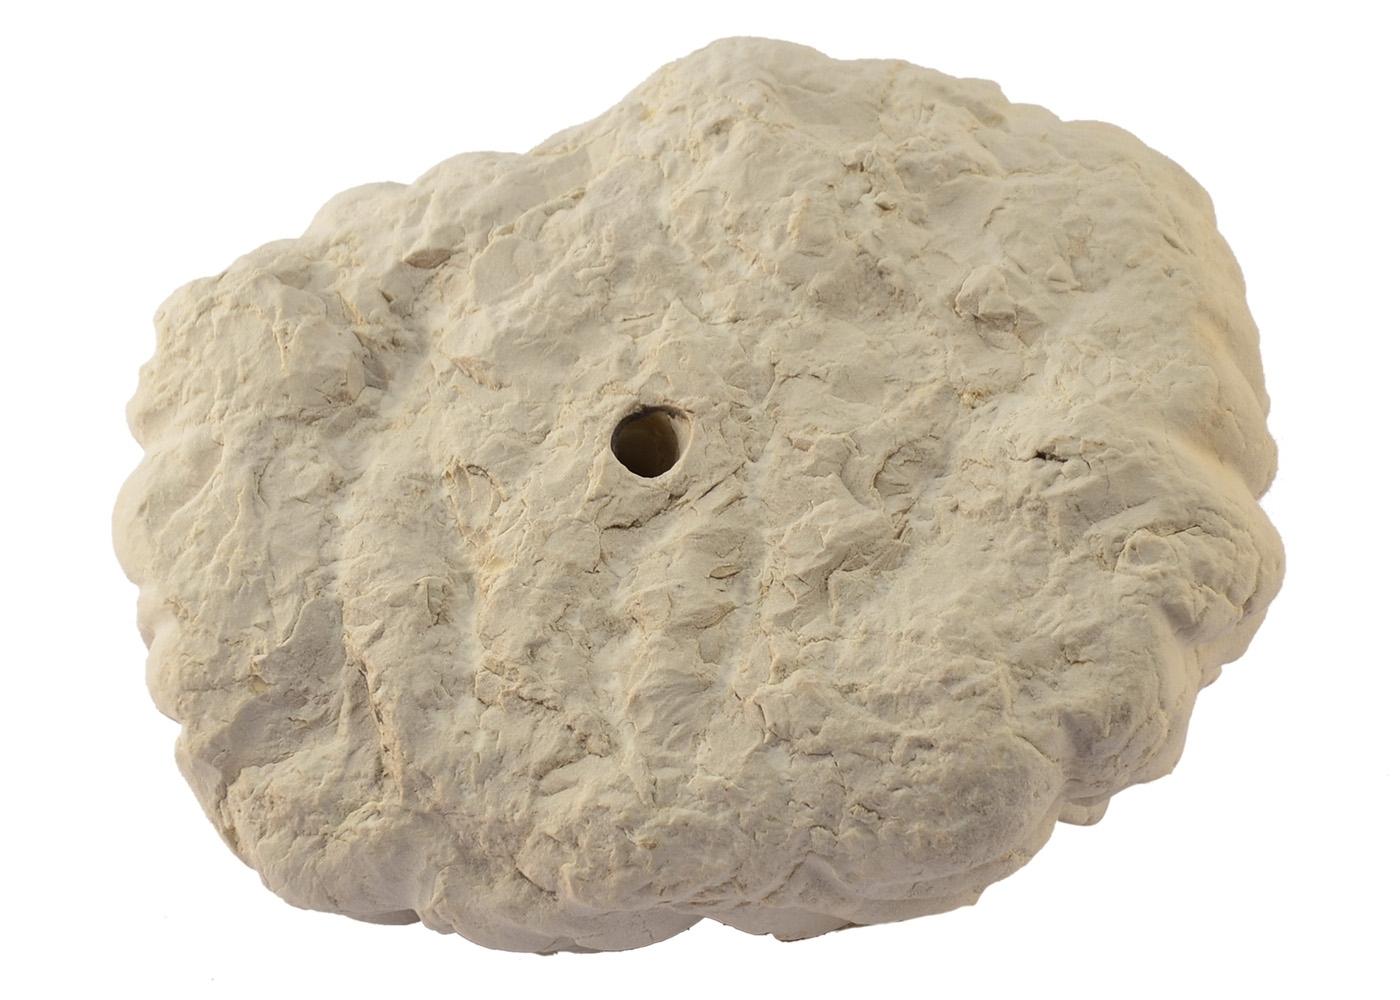 Buy Of Wall Lion Head Marble Fountain 17457750 | Italy2Us.com